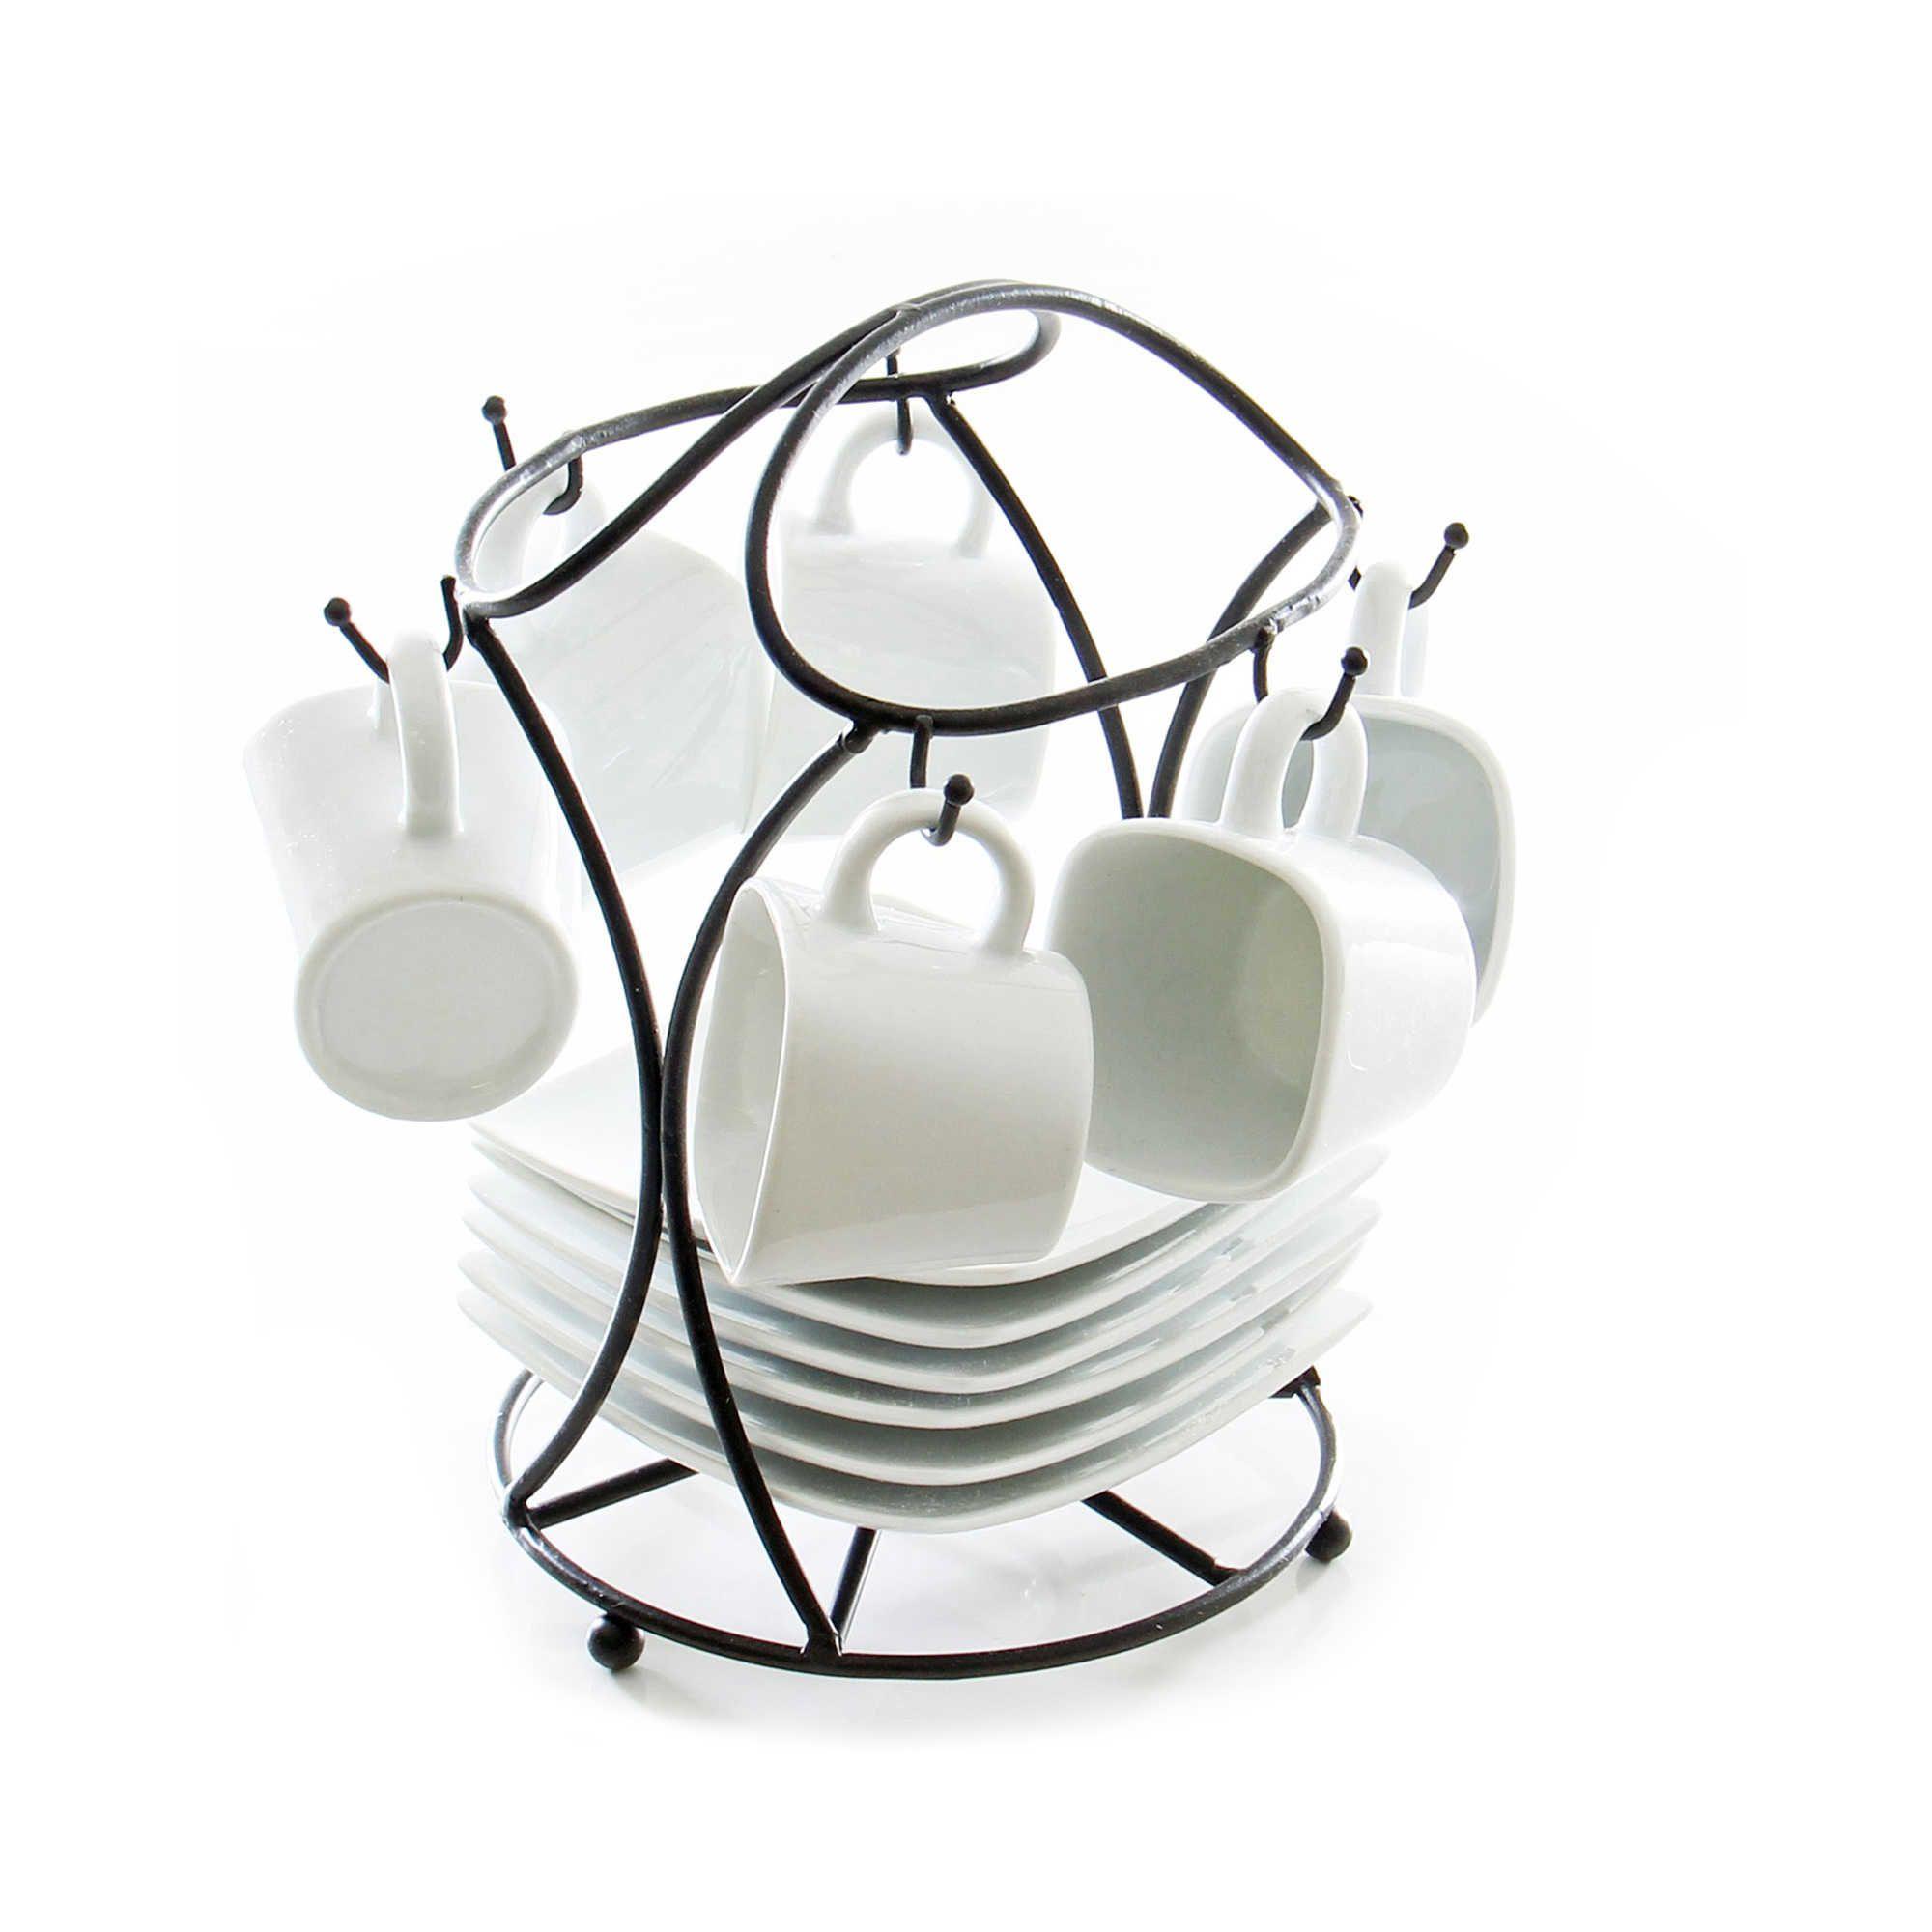 B Smith 13 Piece Espresso Set With Stand Porcelain Tea Set